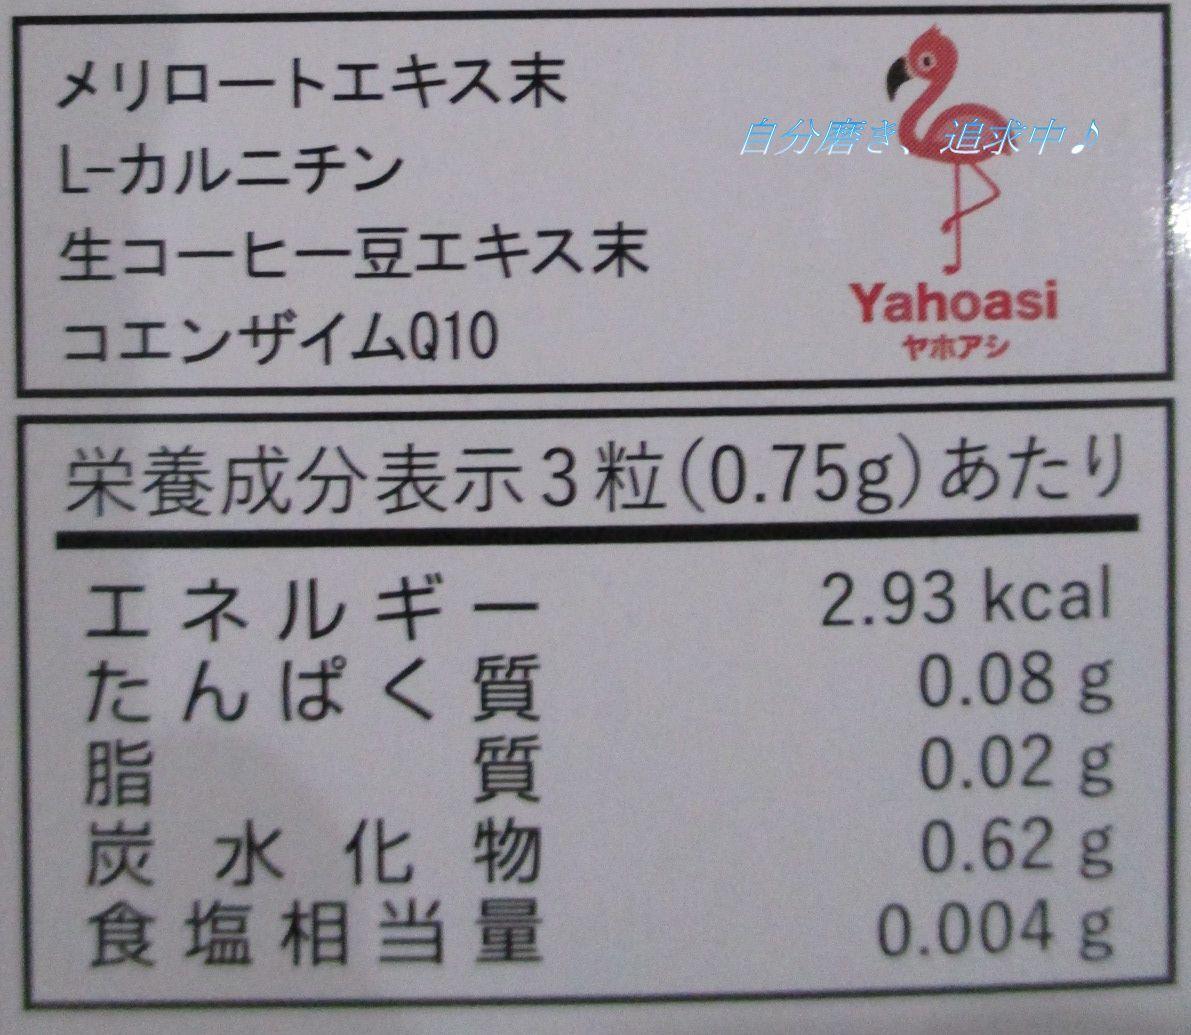 yahoasi2.jpg